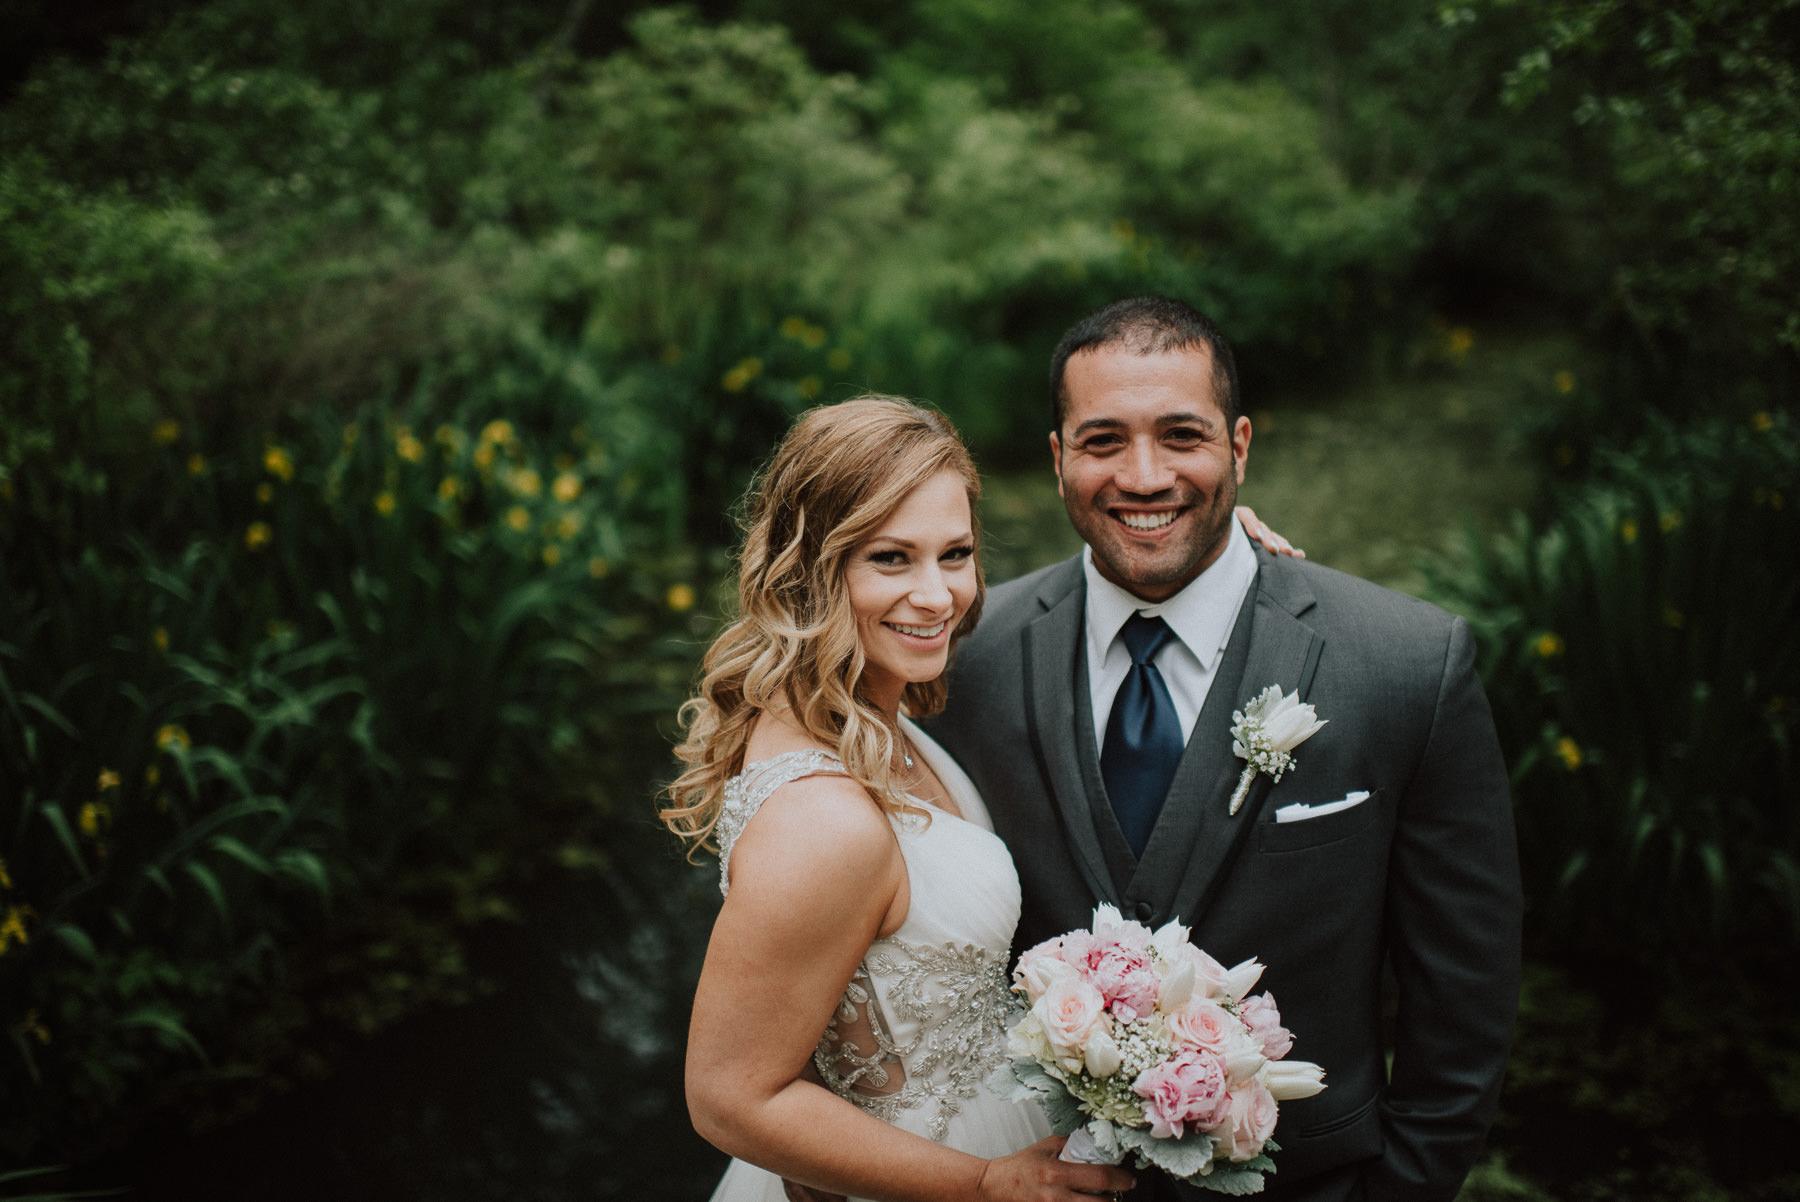 appleford-estate-wedding-photography-44.jpg